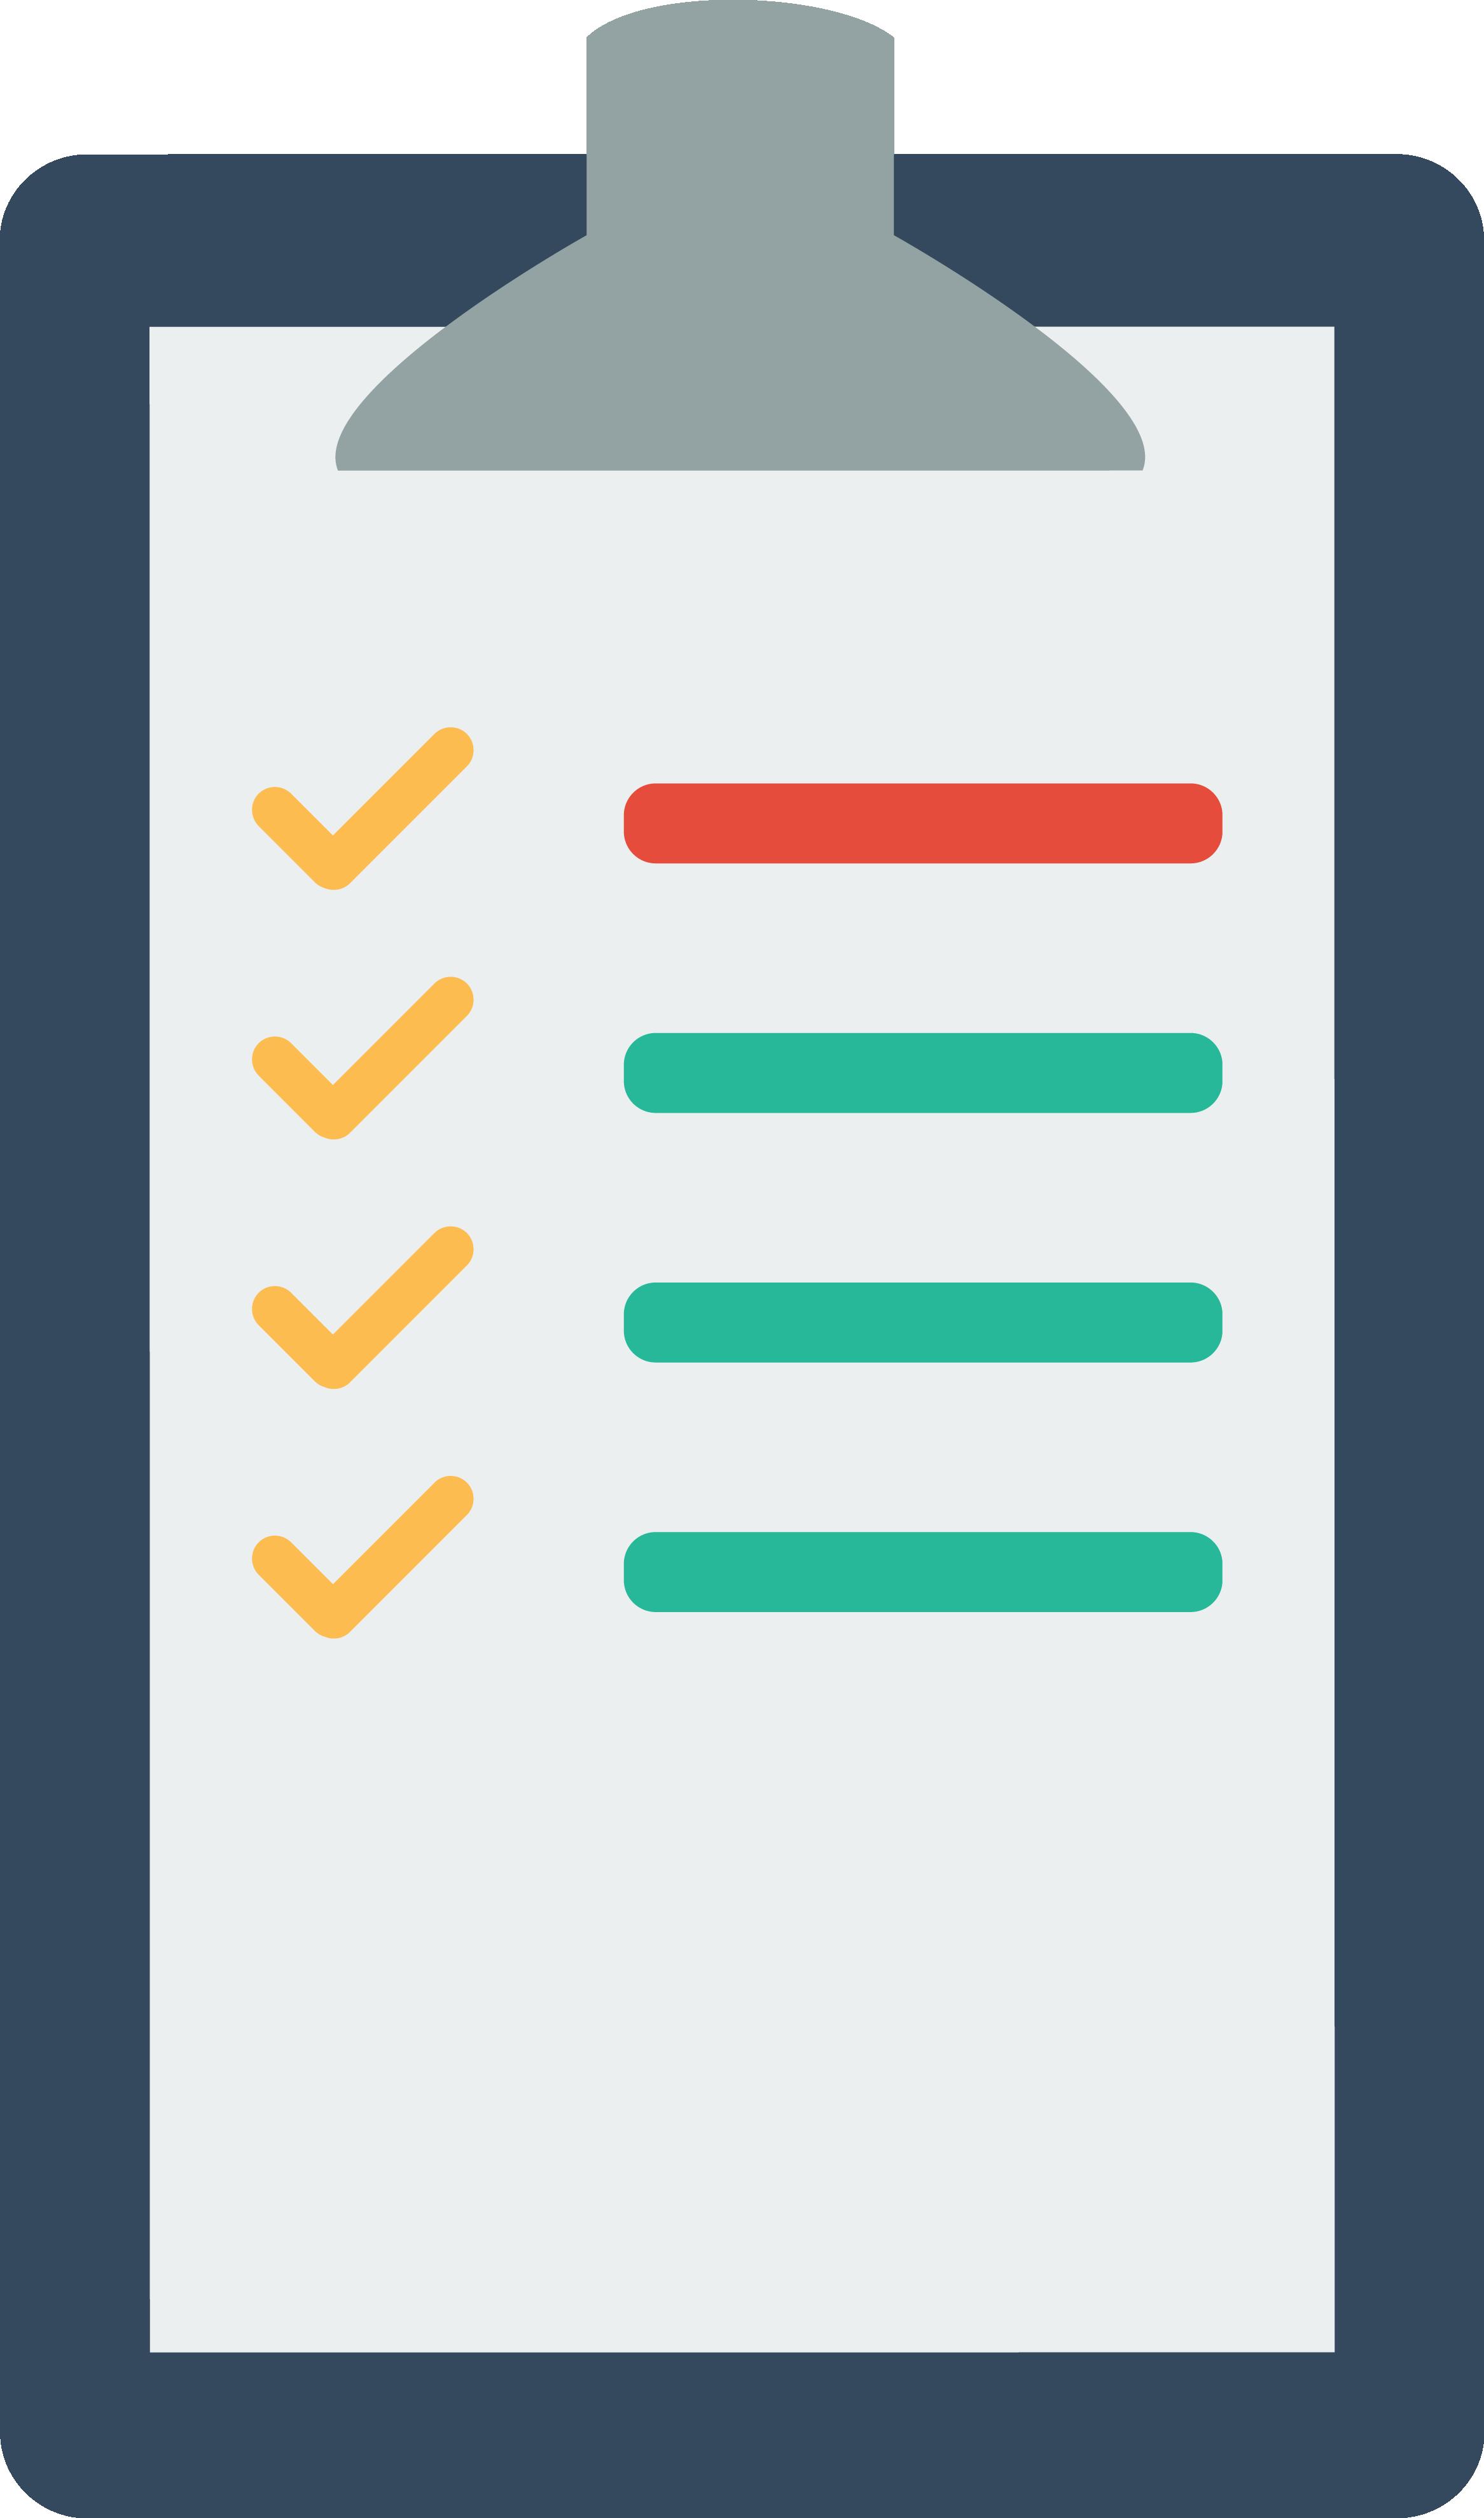 Clipboard_-_with_checklist